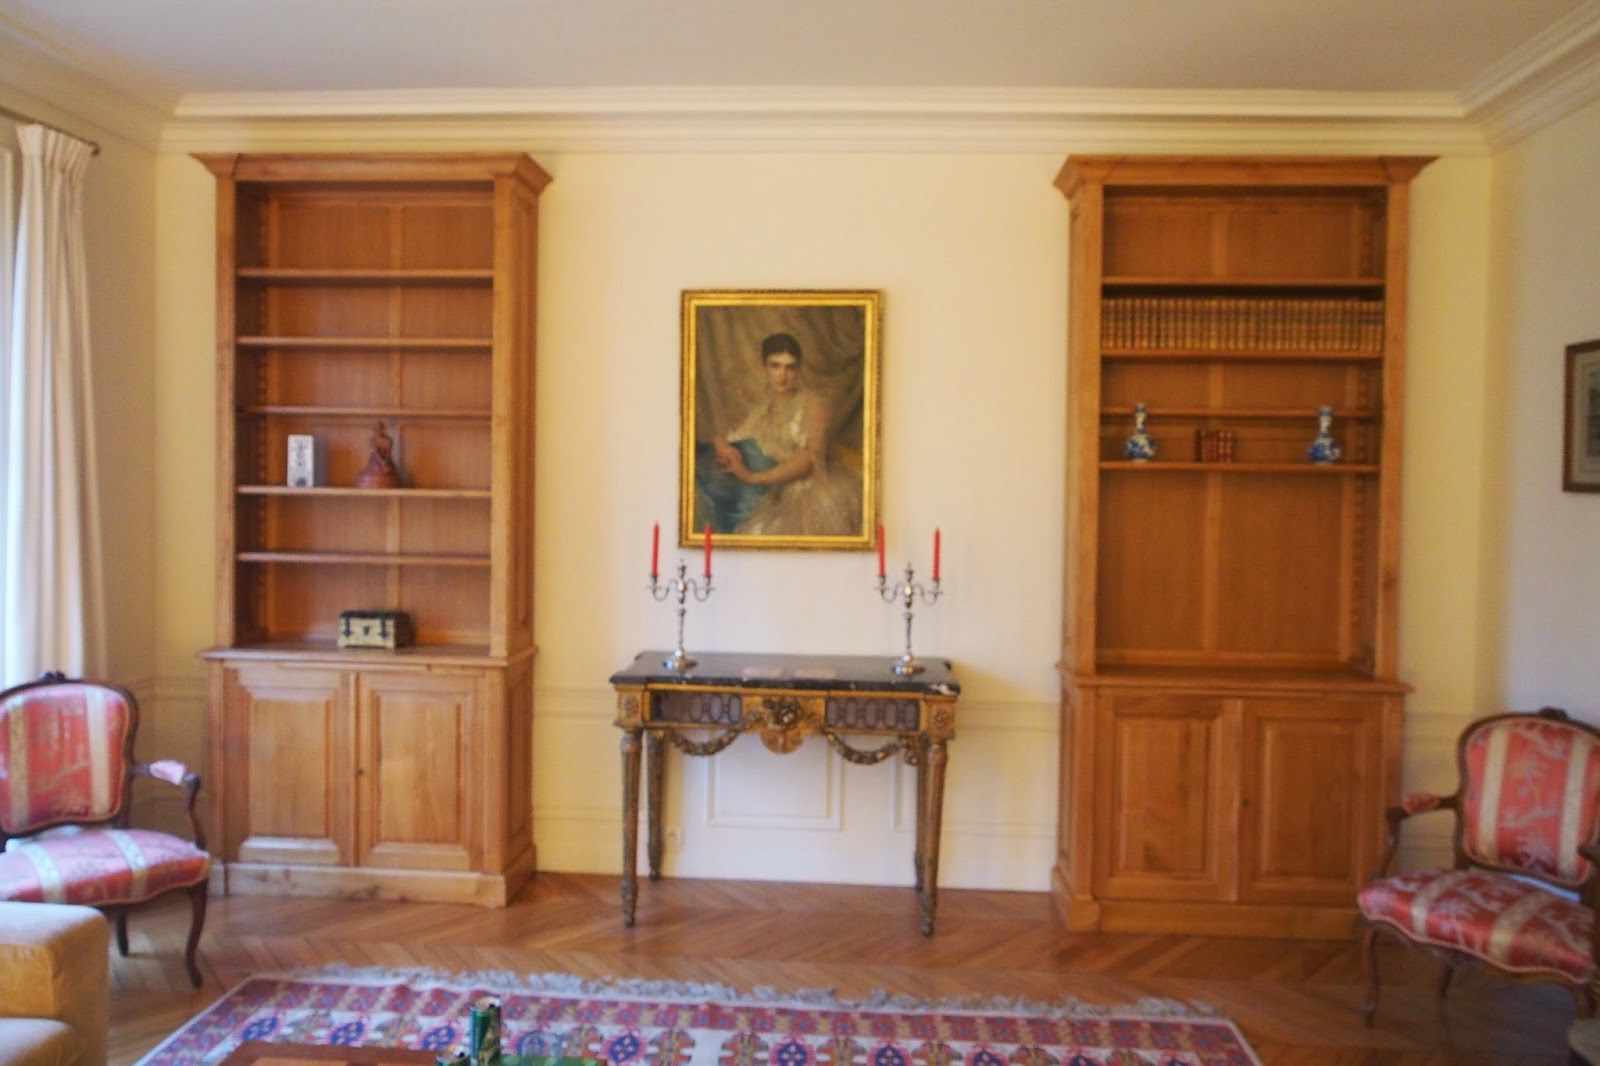 modele bibliotheque en bois pour salon. Black Bedroom Furniture Sets. Home Design Ideas